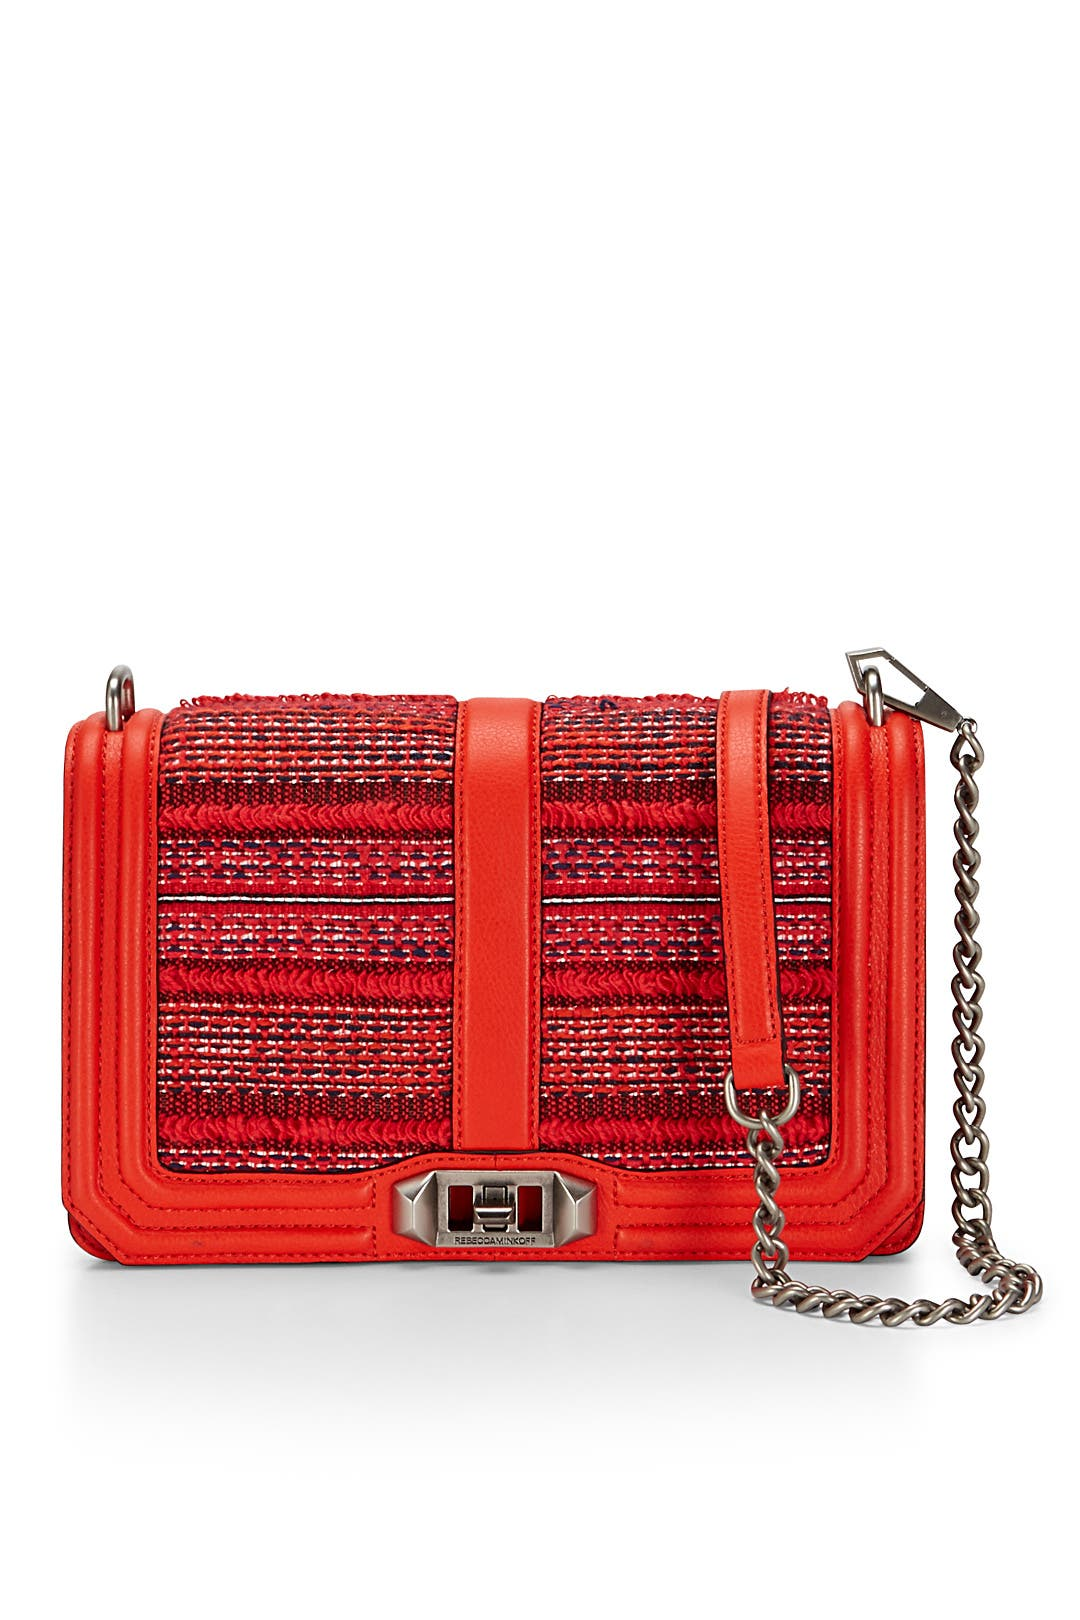 Poppy Red Love Crossbody by Rebecca Minkoff Handbags